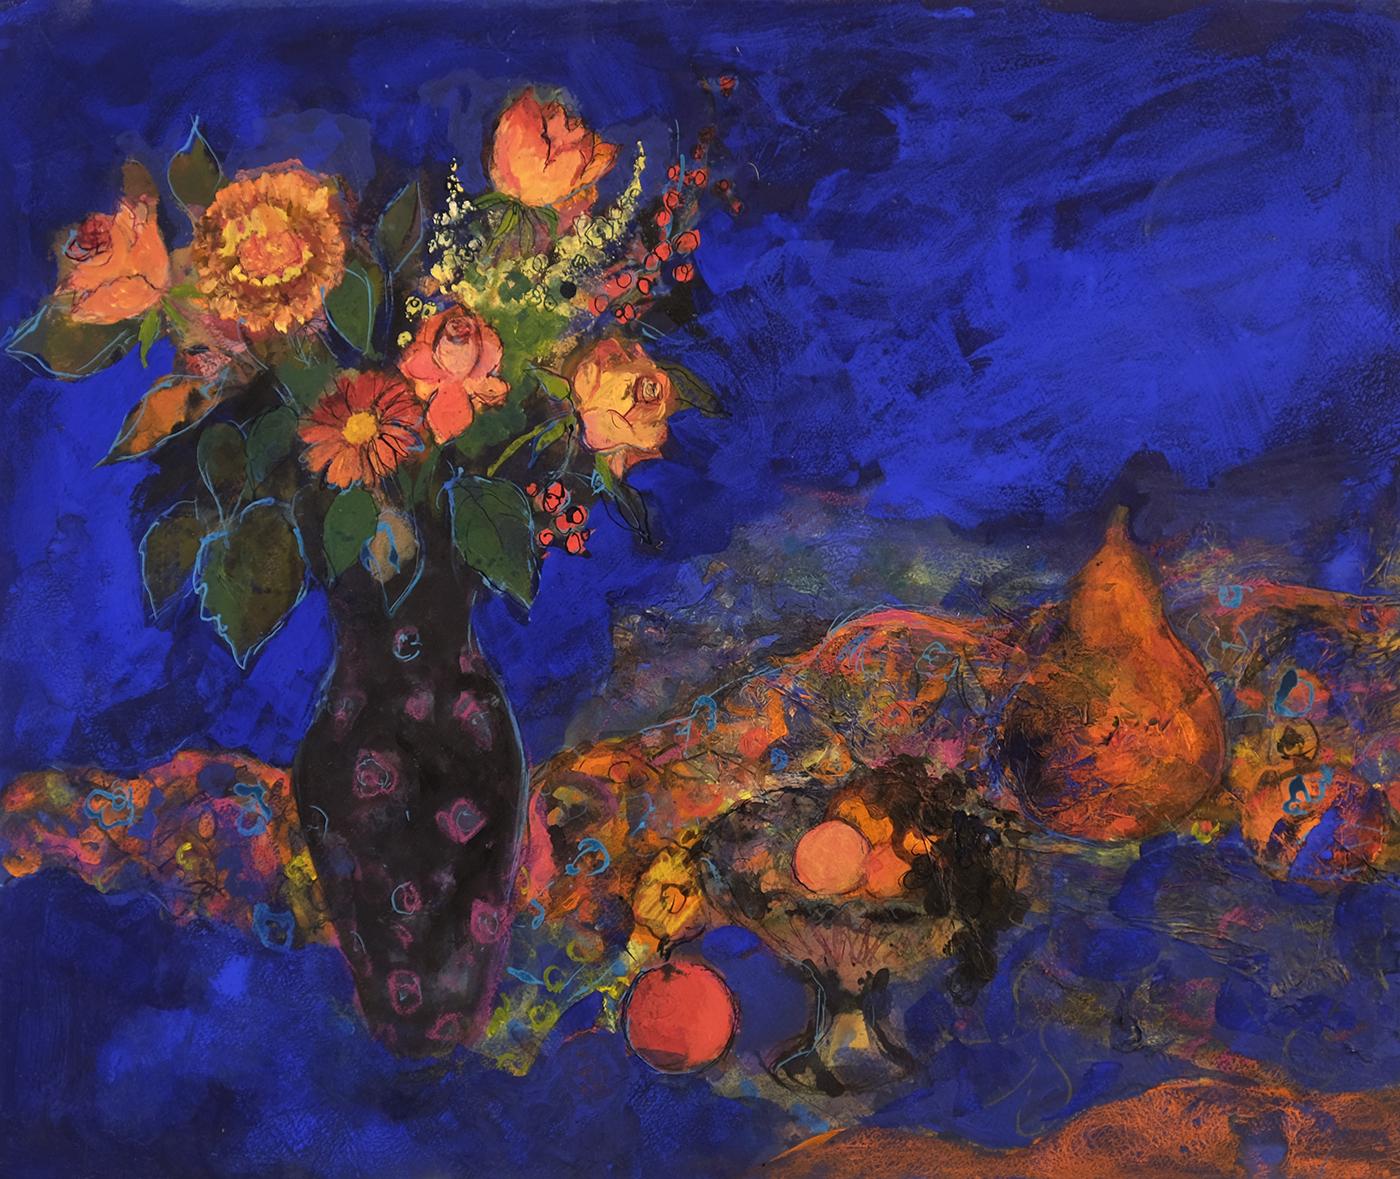 Ann Oram, Midnight Still Life, Mixed Media, Watercolour paper, 67 x 78cm